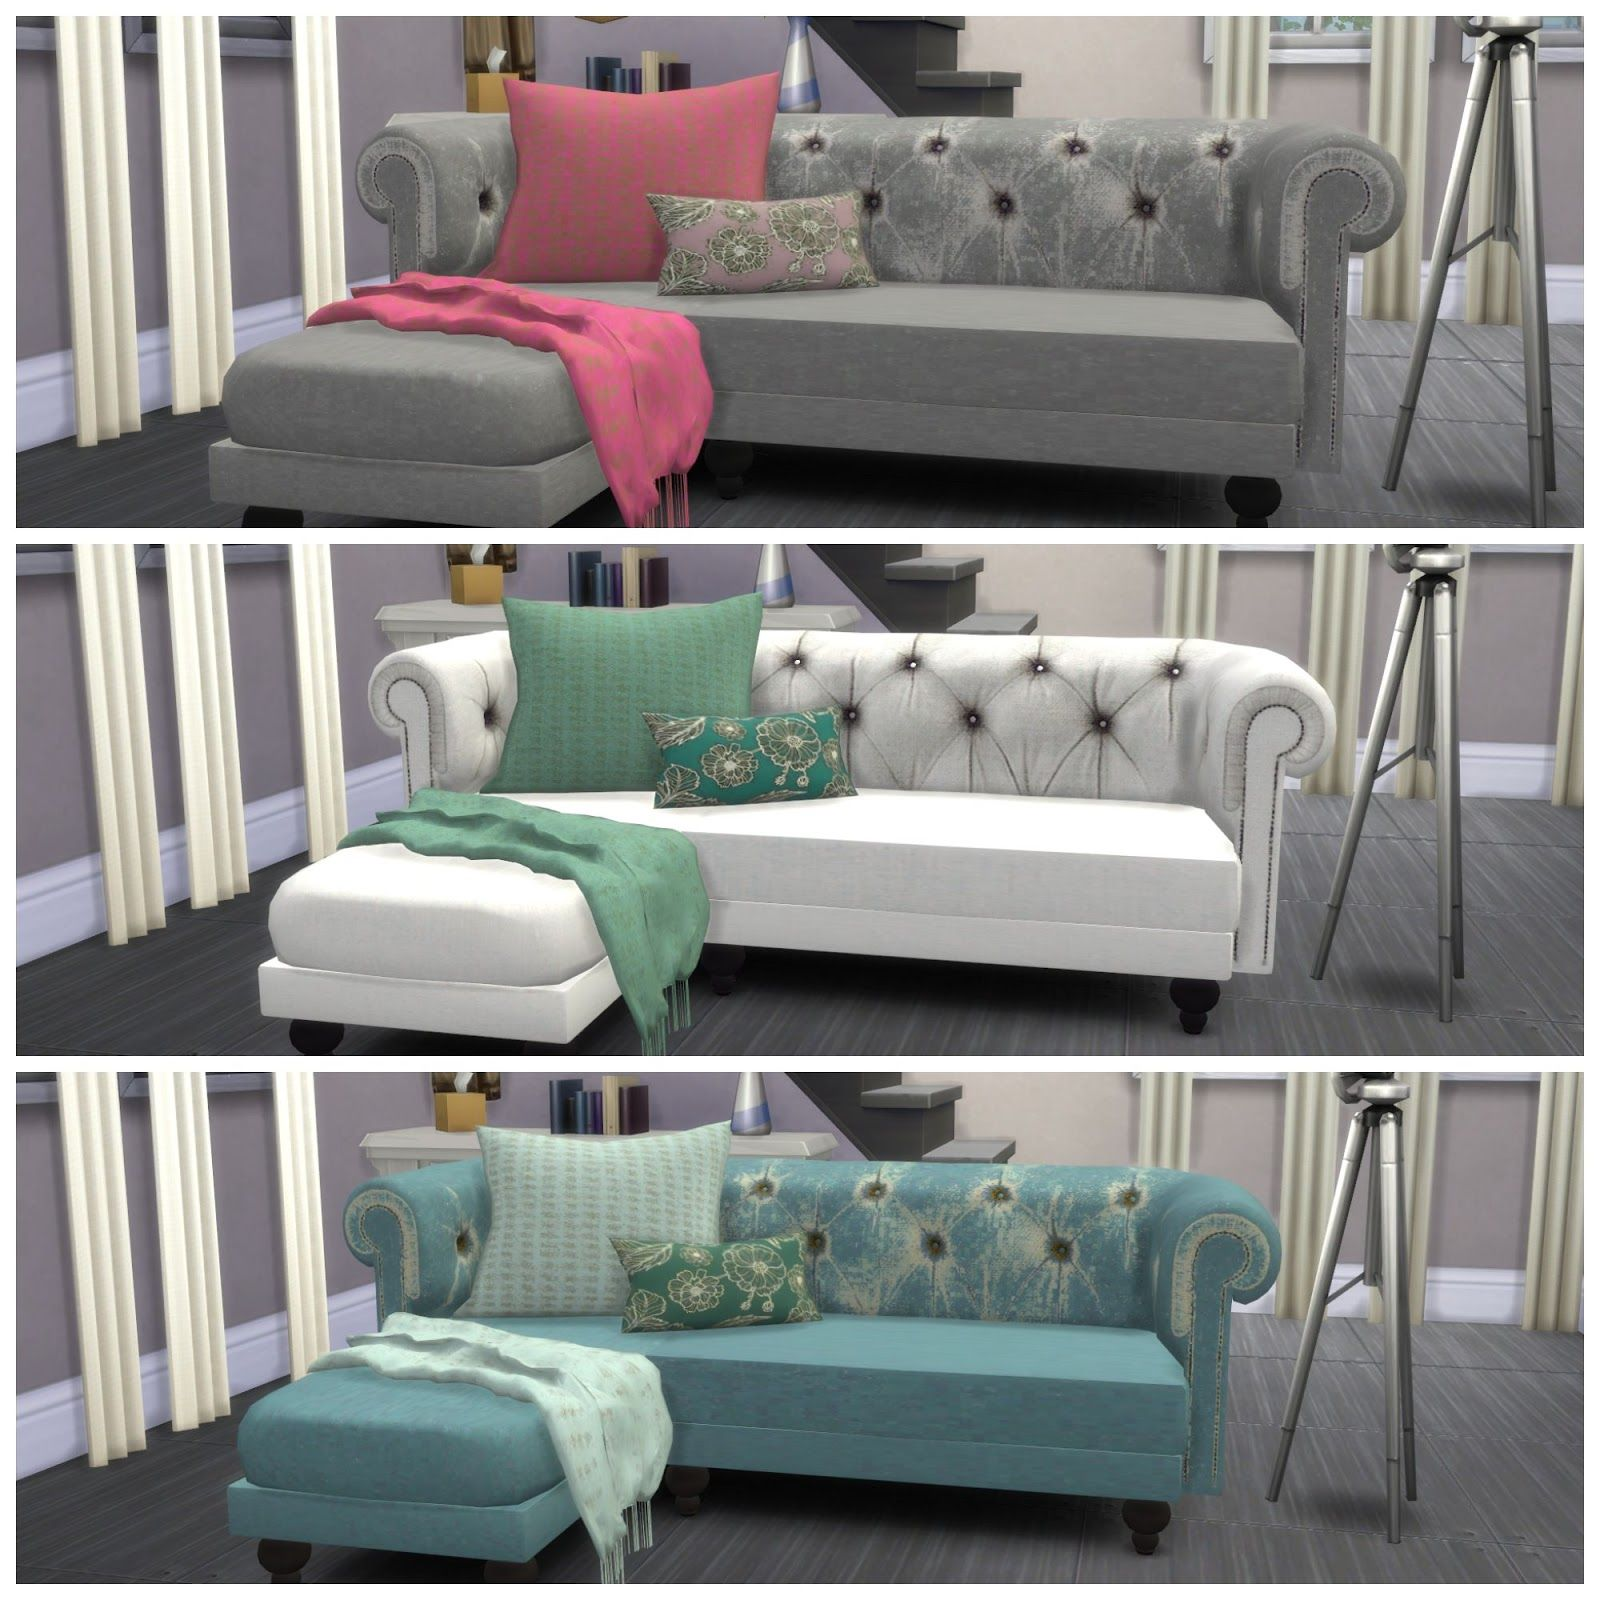 Dinha recolors sof sims 4 sims 4 pinterest for Dormitorio sims 4